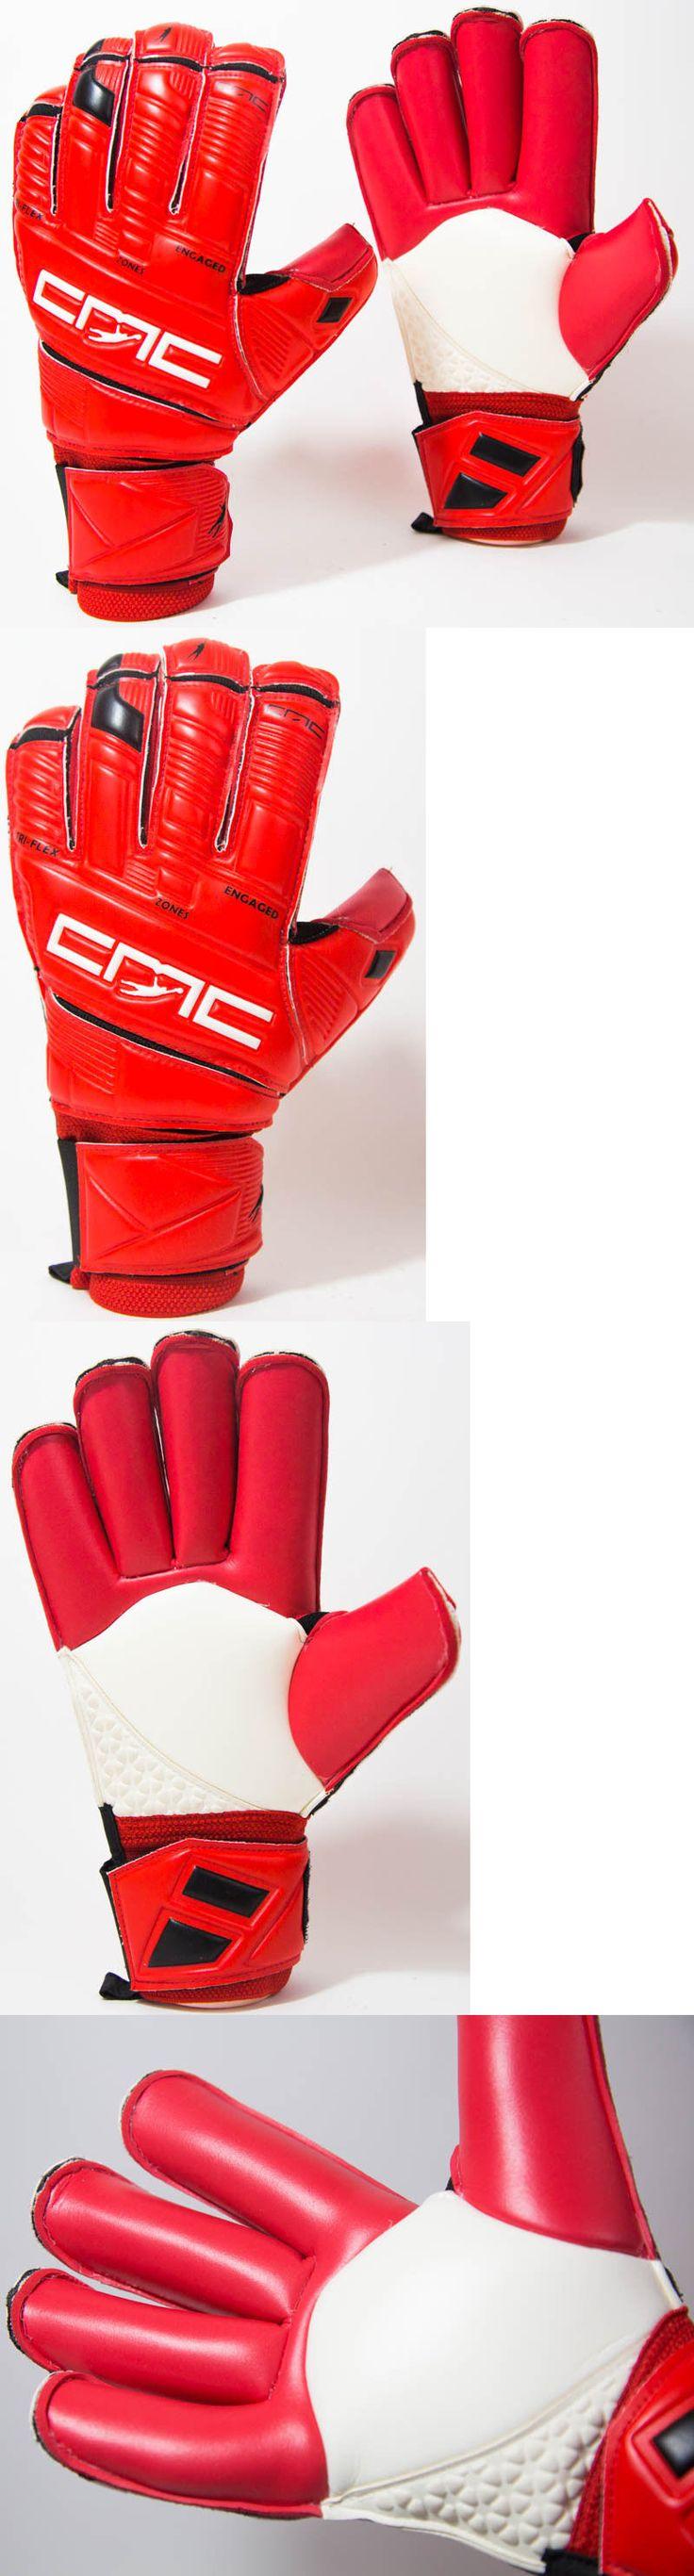 Driving gloves argos - Gloves 57277 2017 Cmc Pro Zones Contact Roll Fingersave Soccer Goalkeeper Goalie Gloves Sz 8